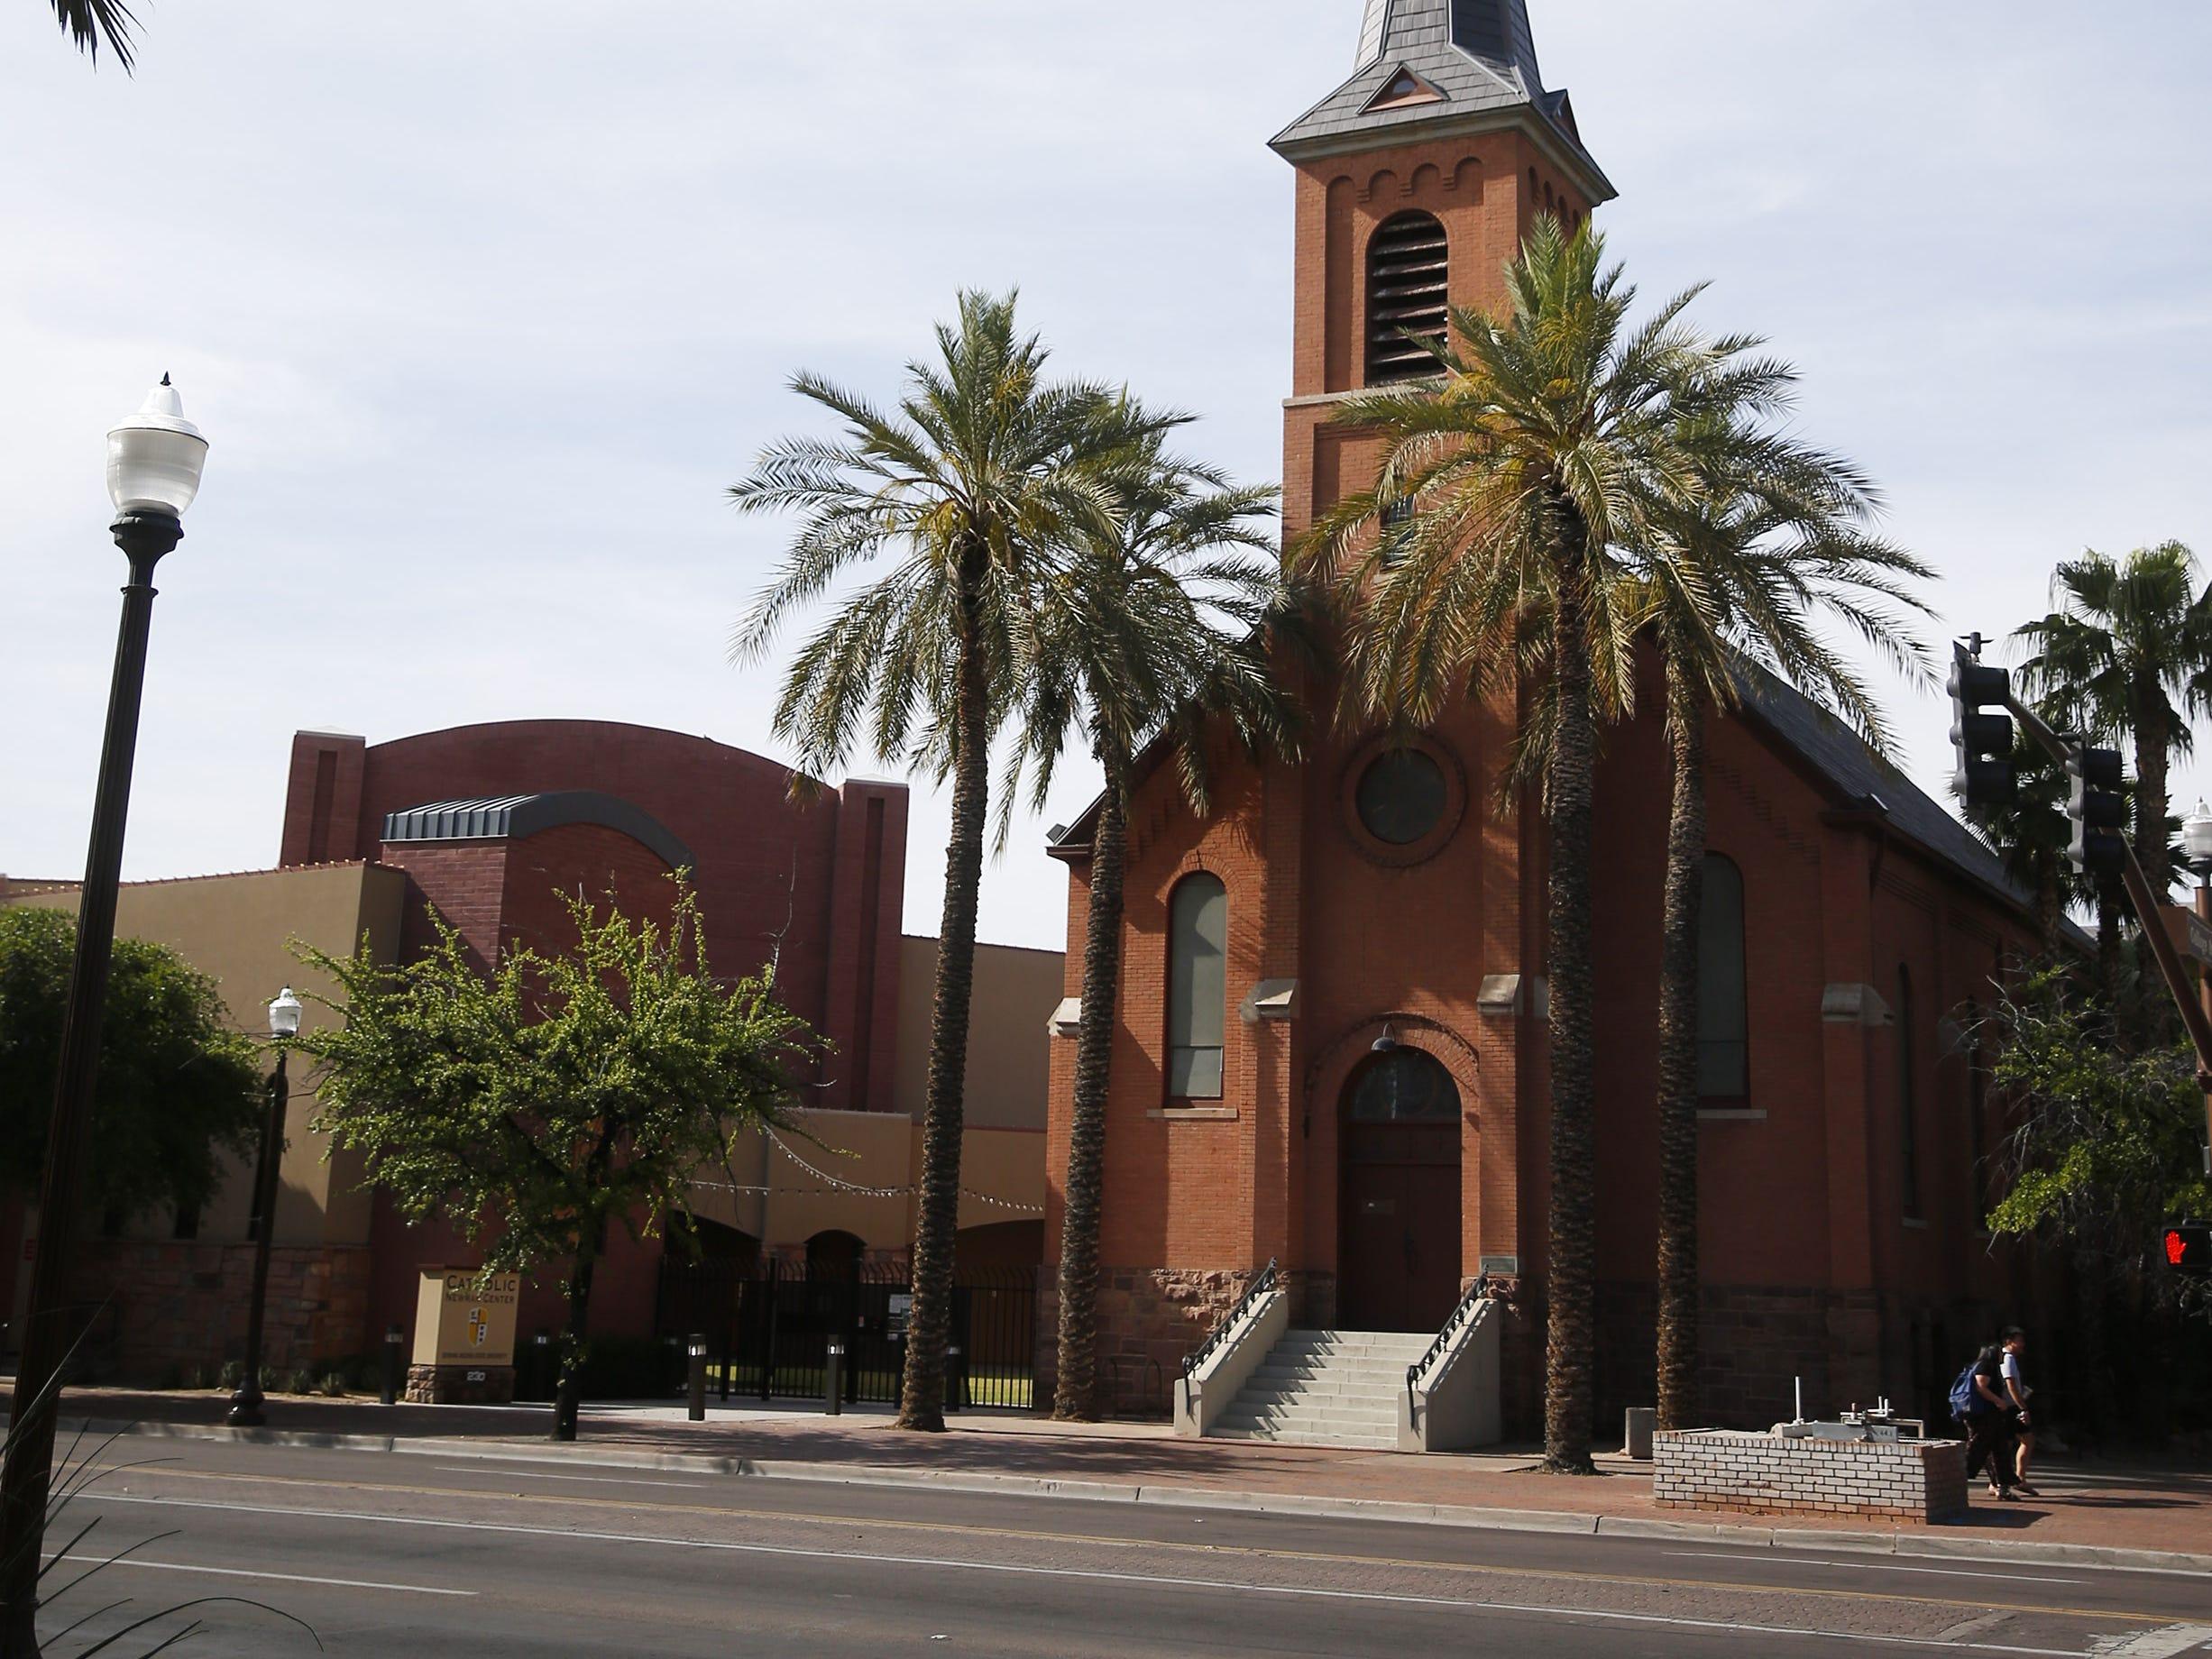 Exterior of the ASU Catholic Newman Center in Tempe, Ariz. April 14, 2019.